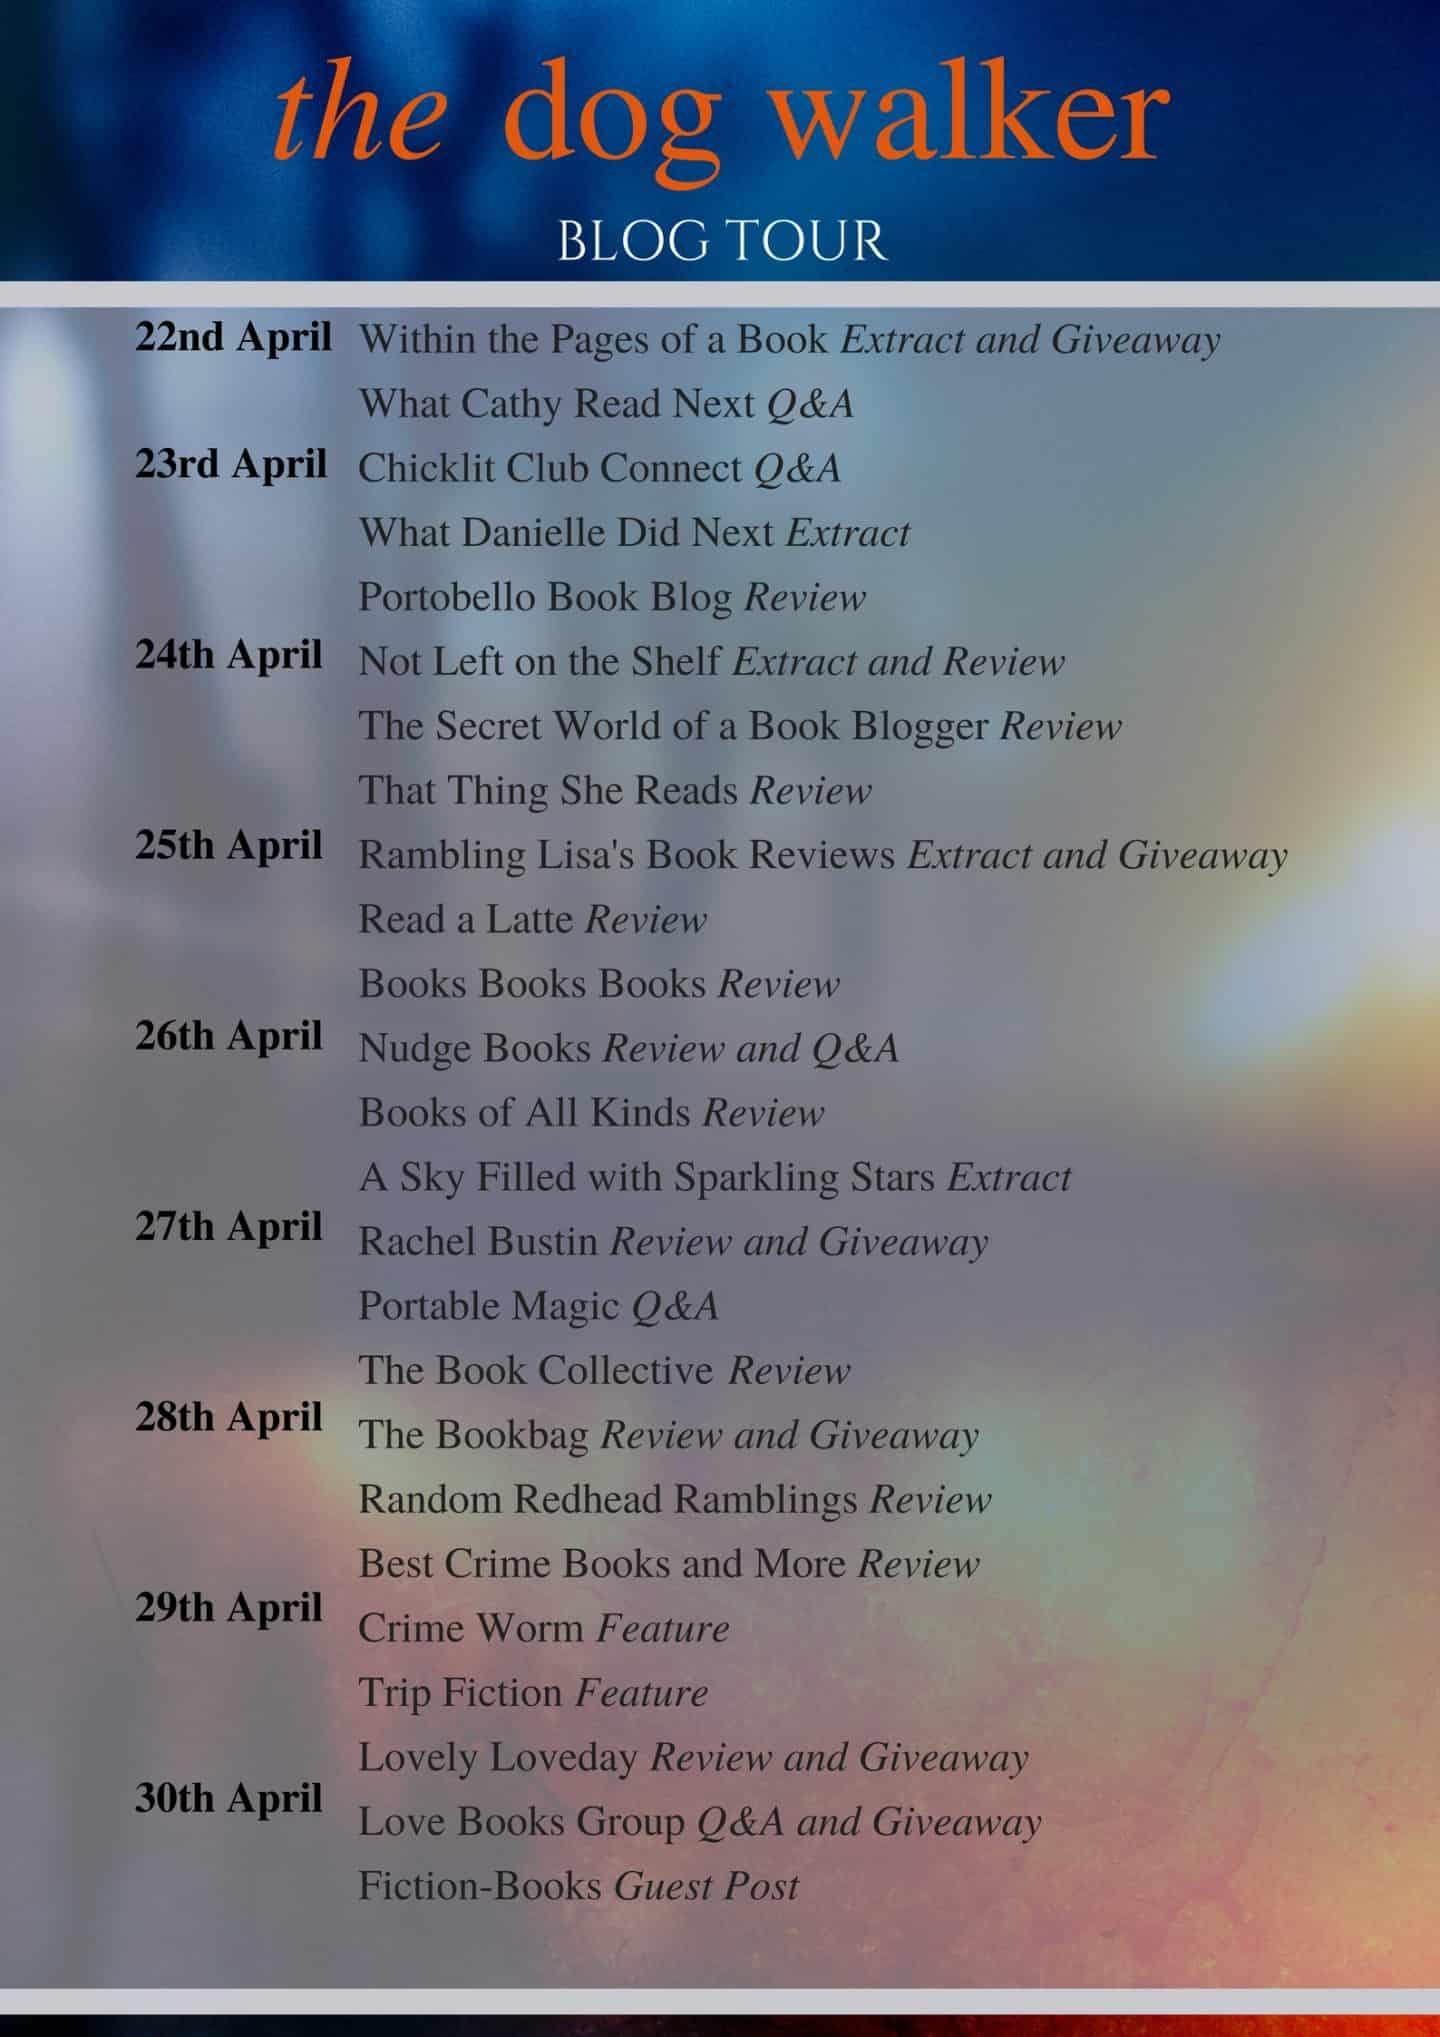 Blog Tour Banner for The Dog Walker by Lesley Thomson